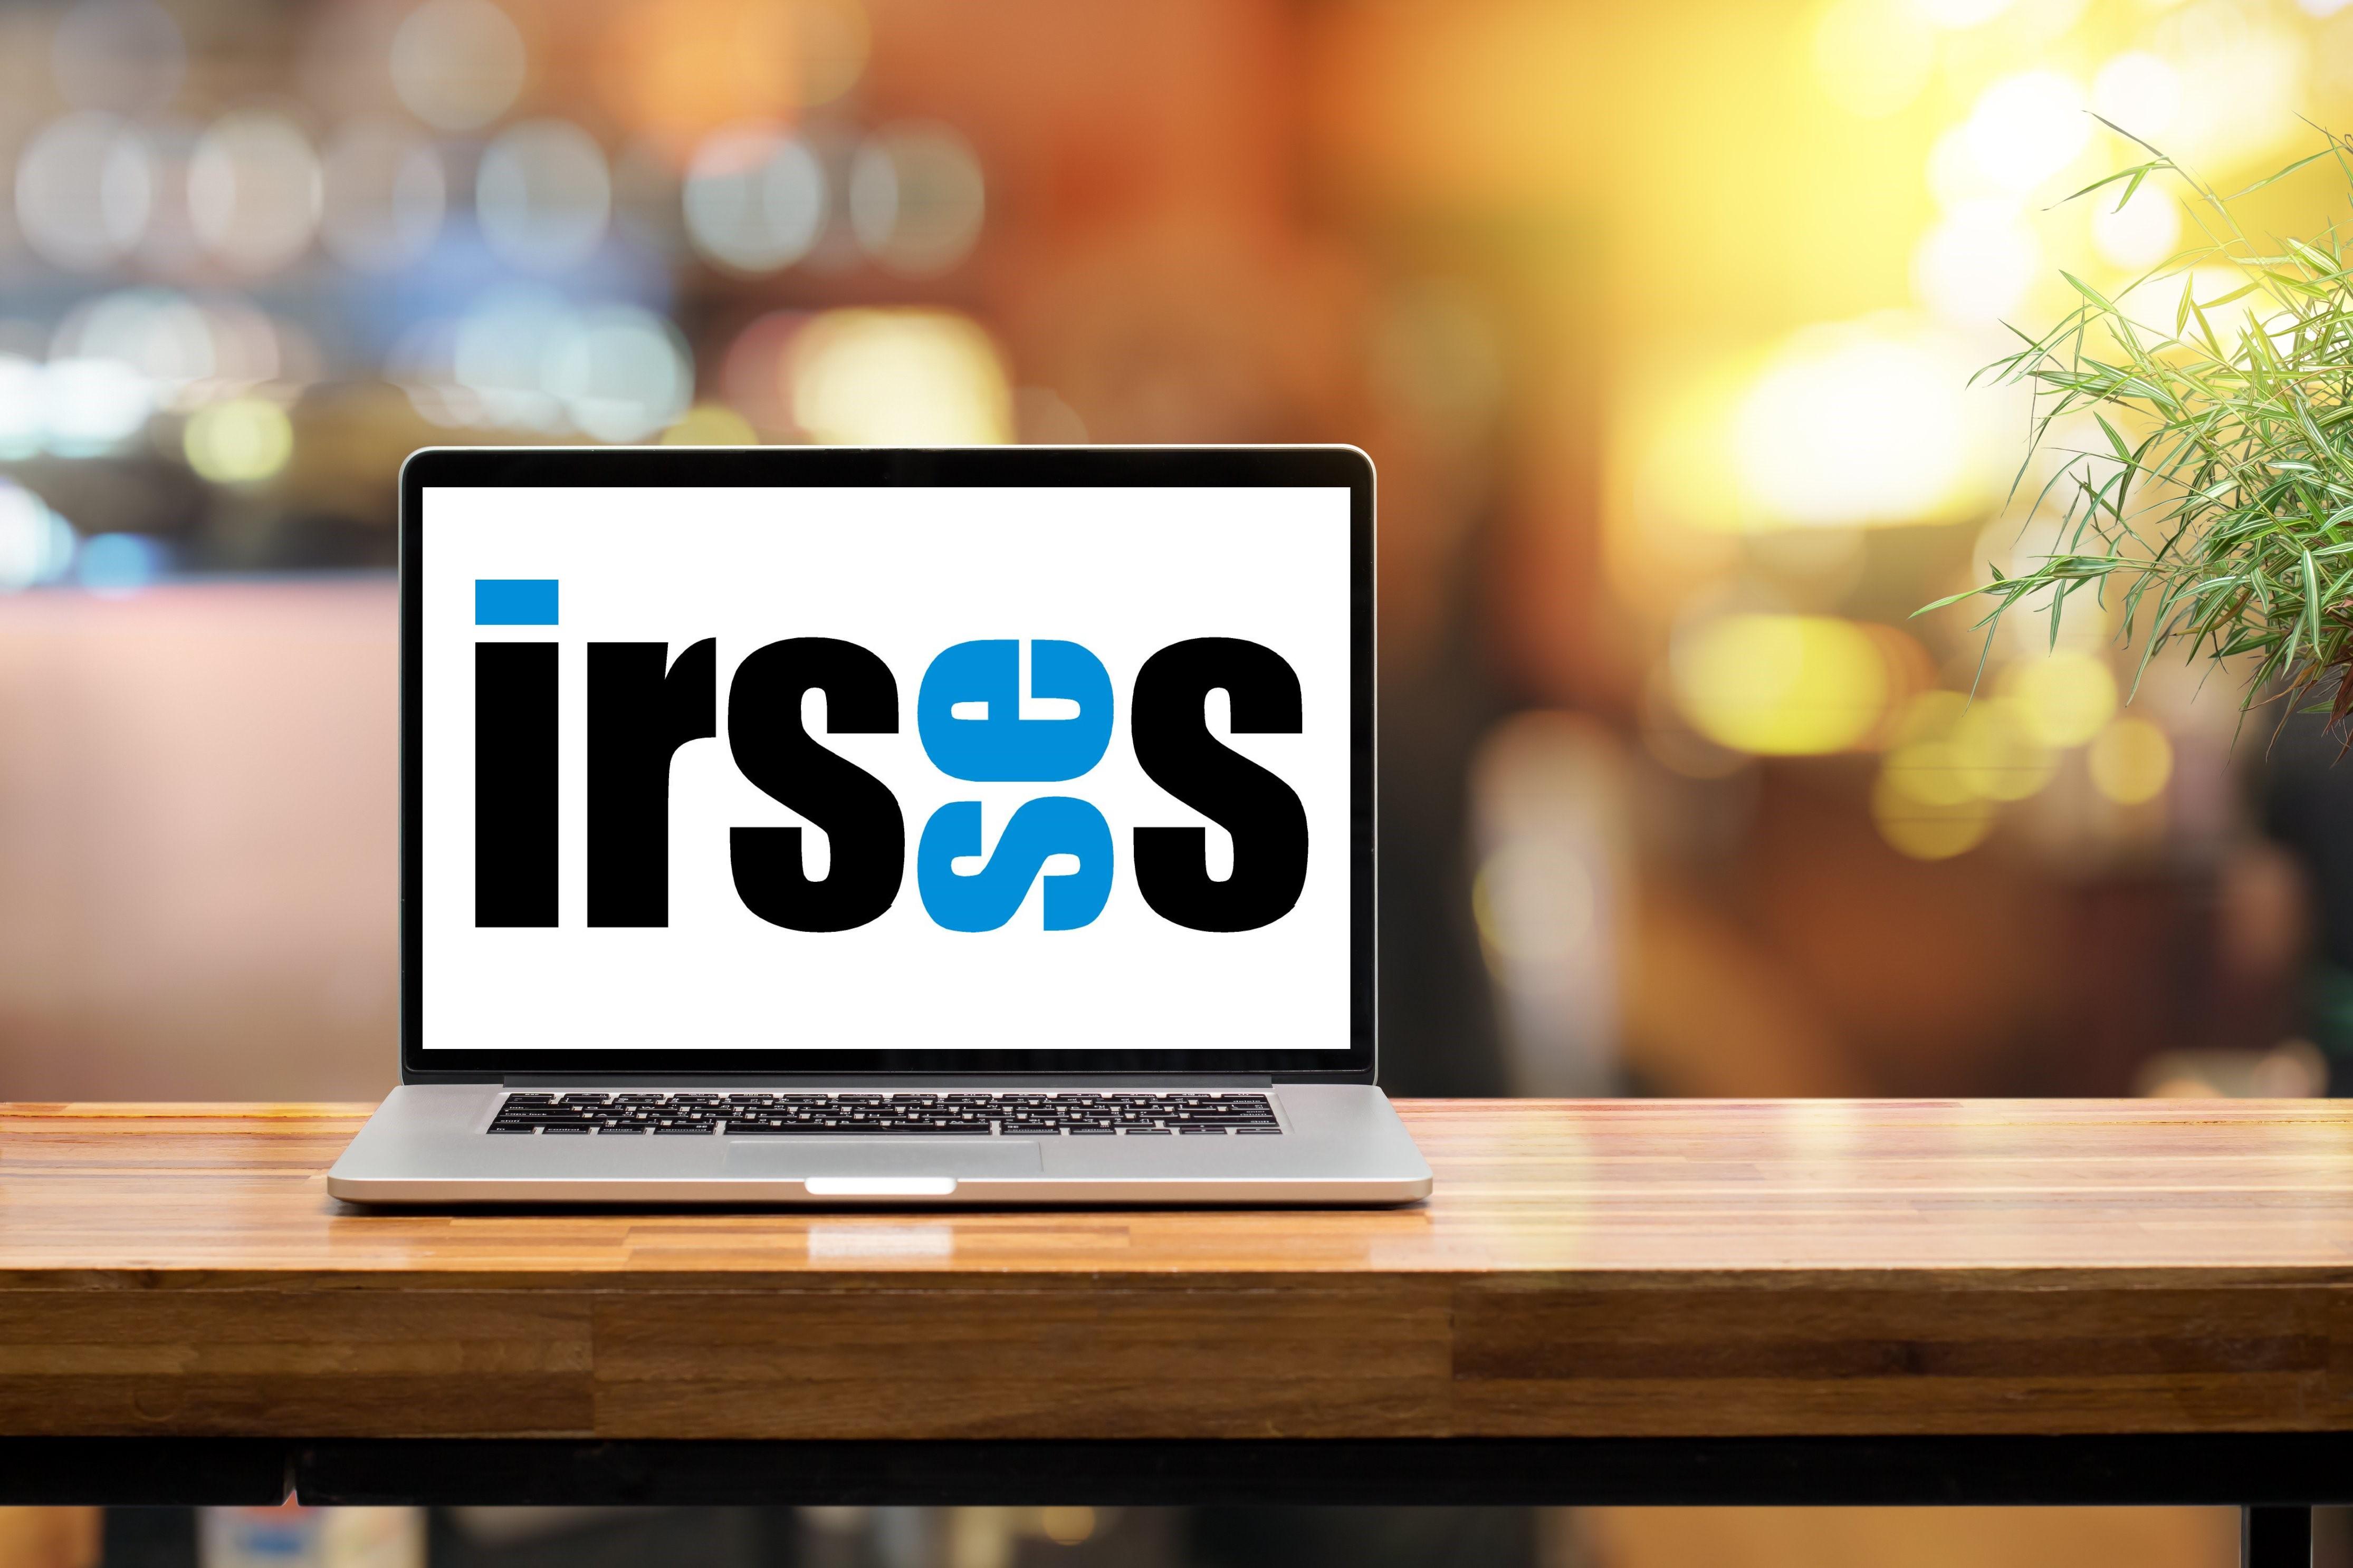 laptop-IRSSeS